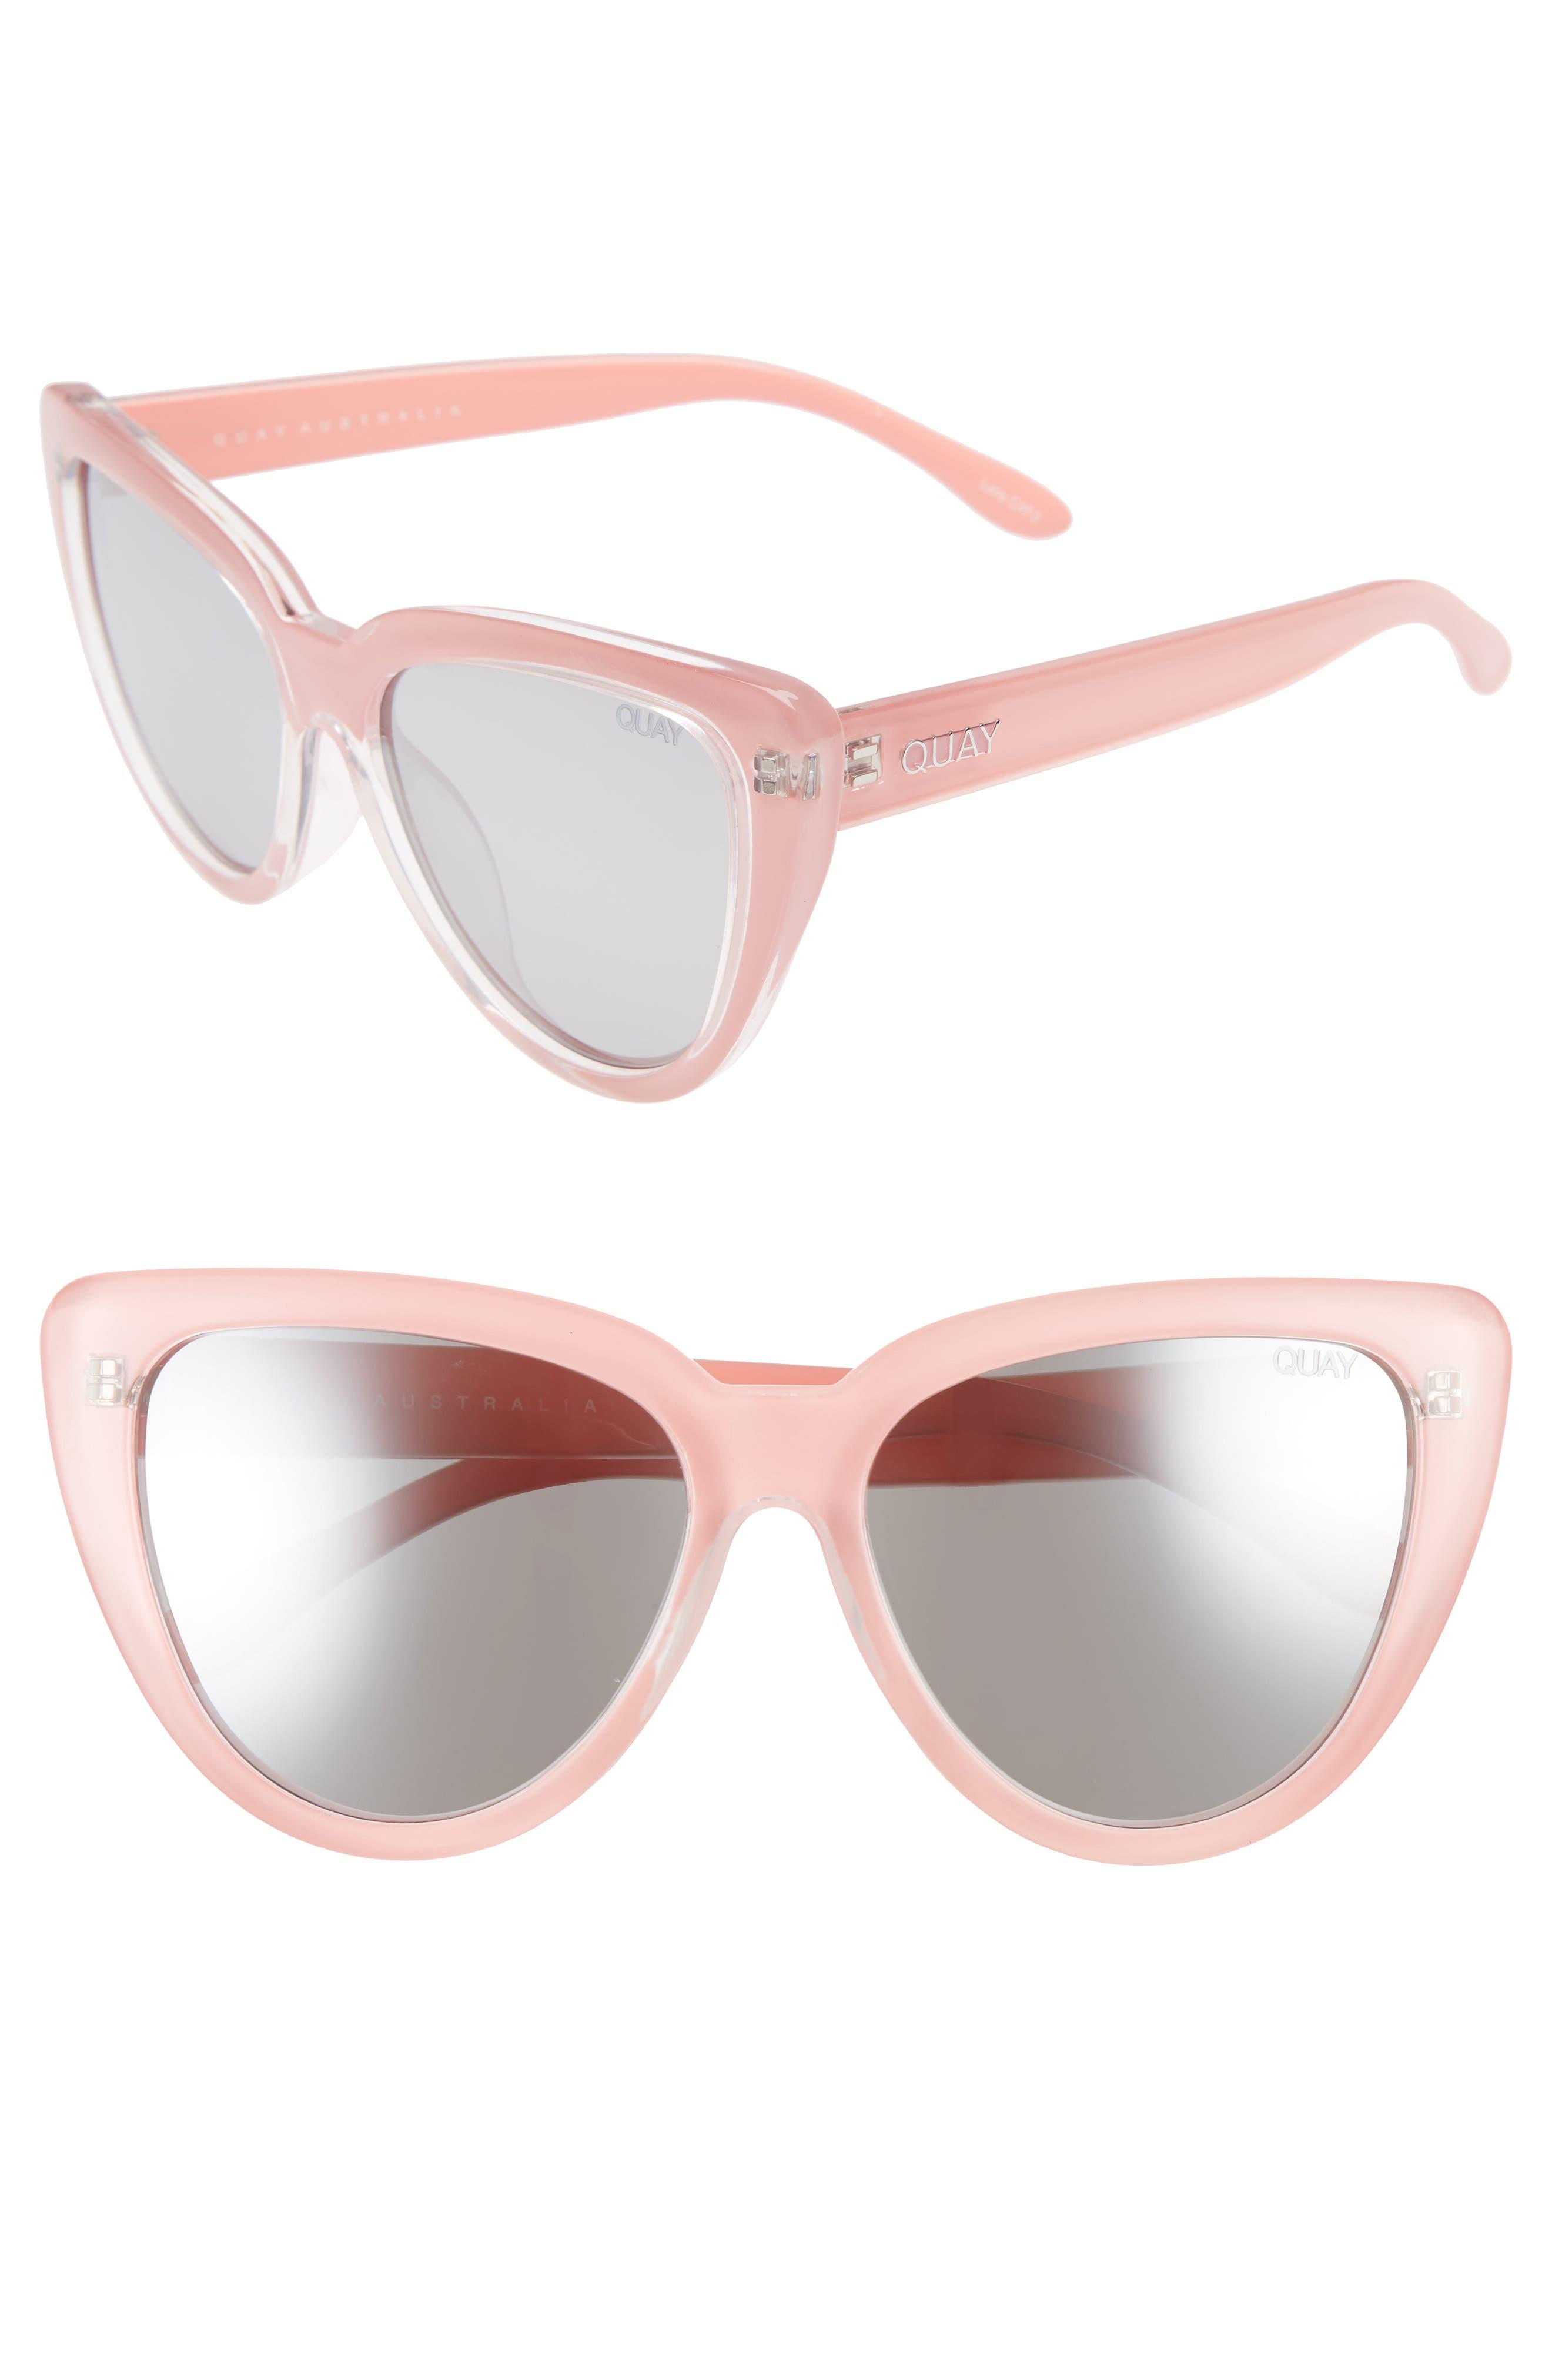 Stray Cat 58mm Mirrored Cat Eye Sunglasses,                         Main,                         color, Peach/ Gradual Flash Mirror